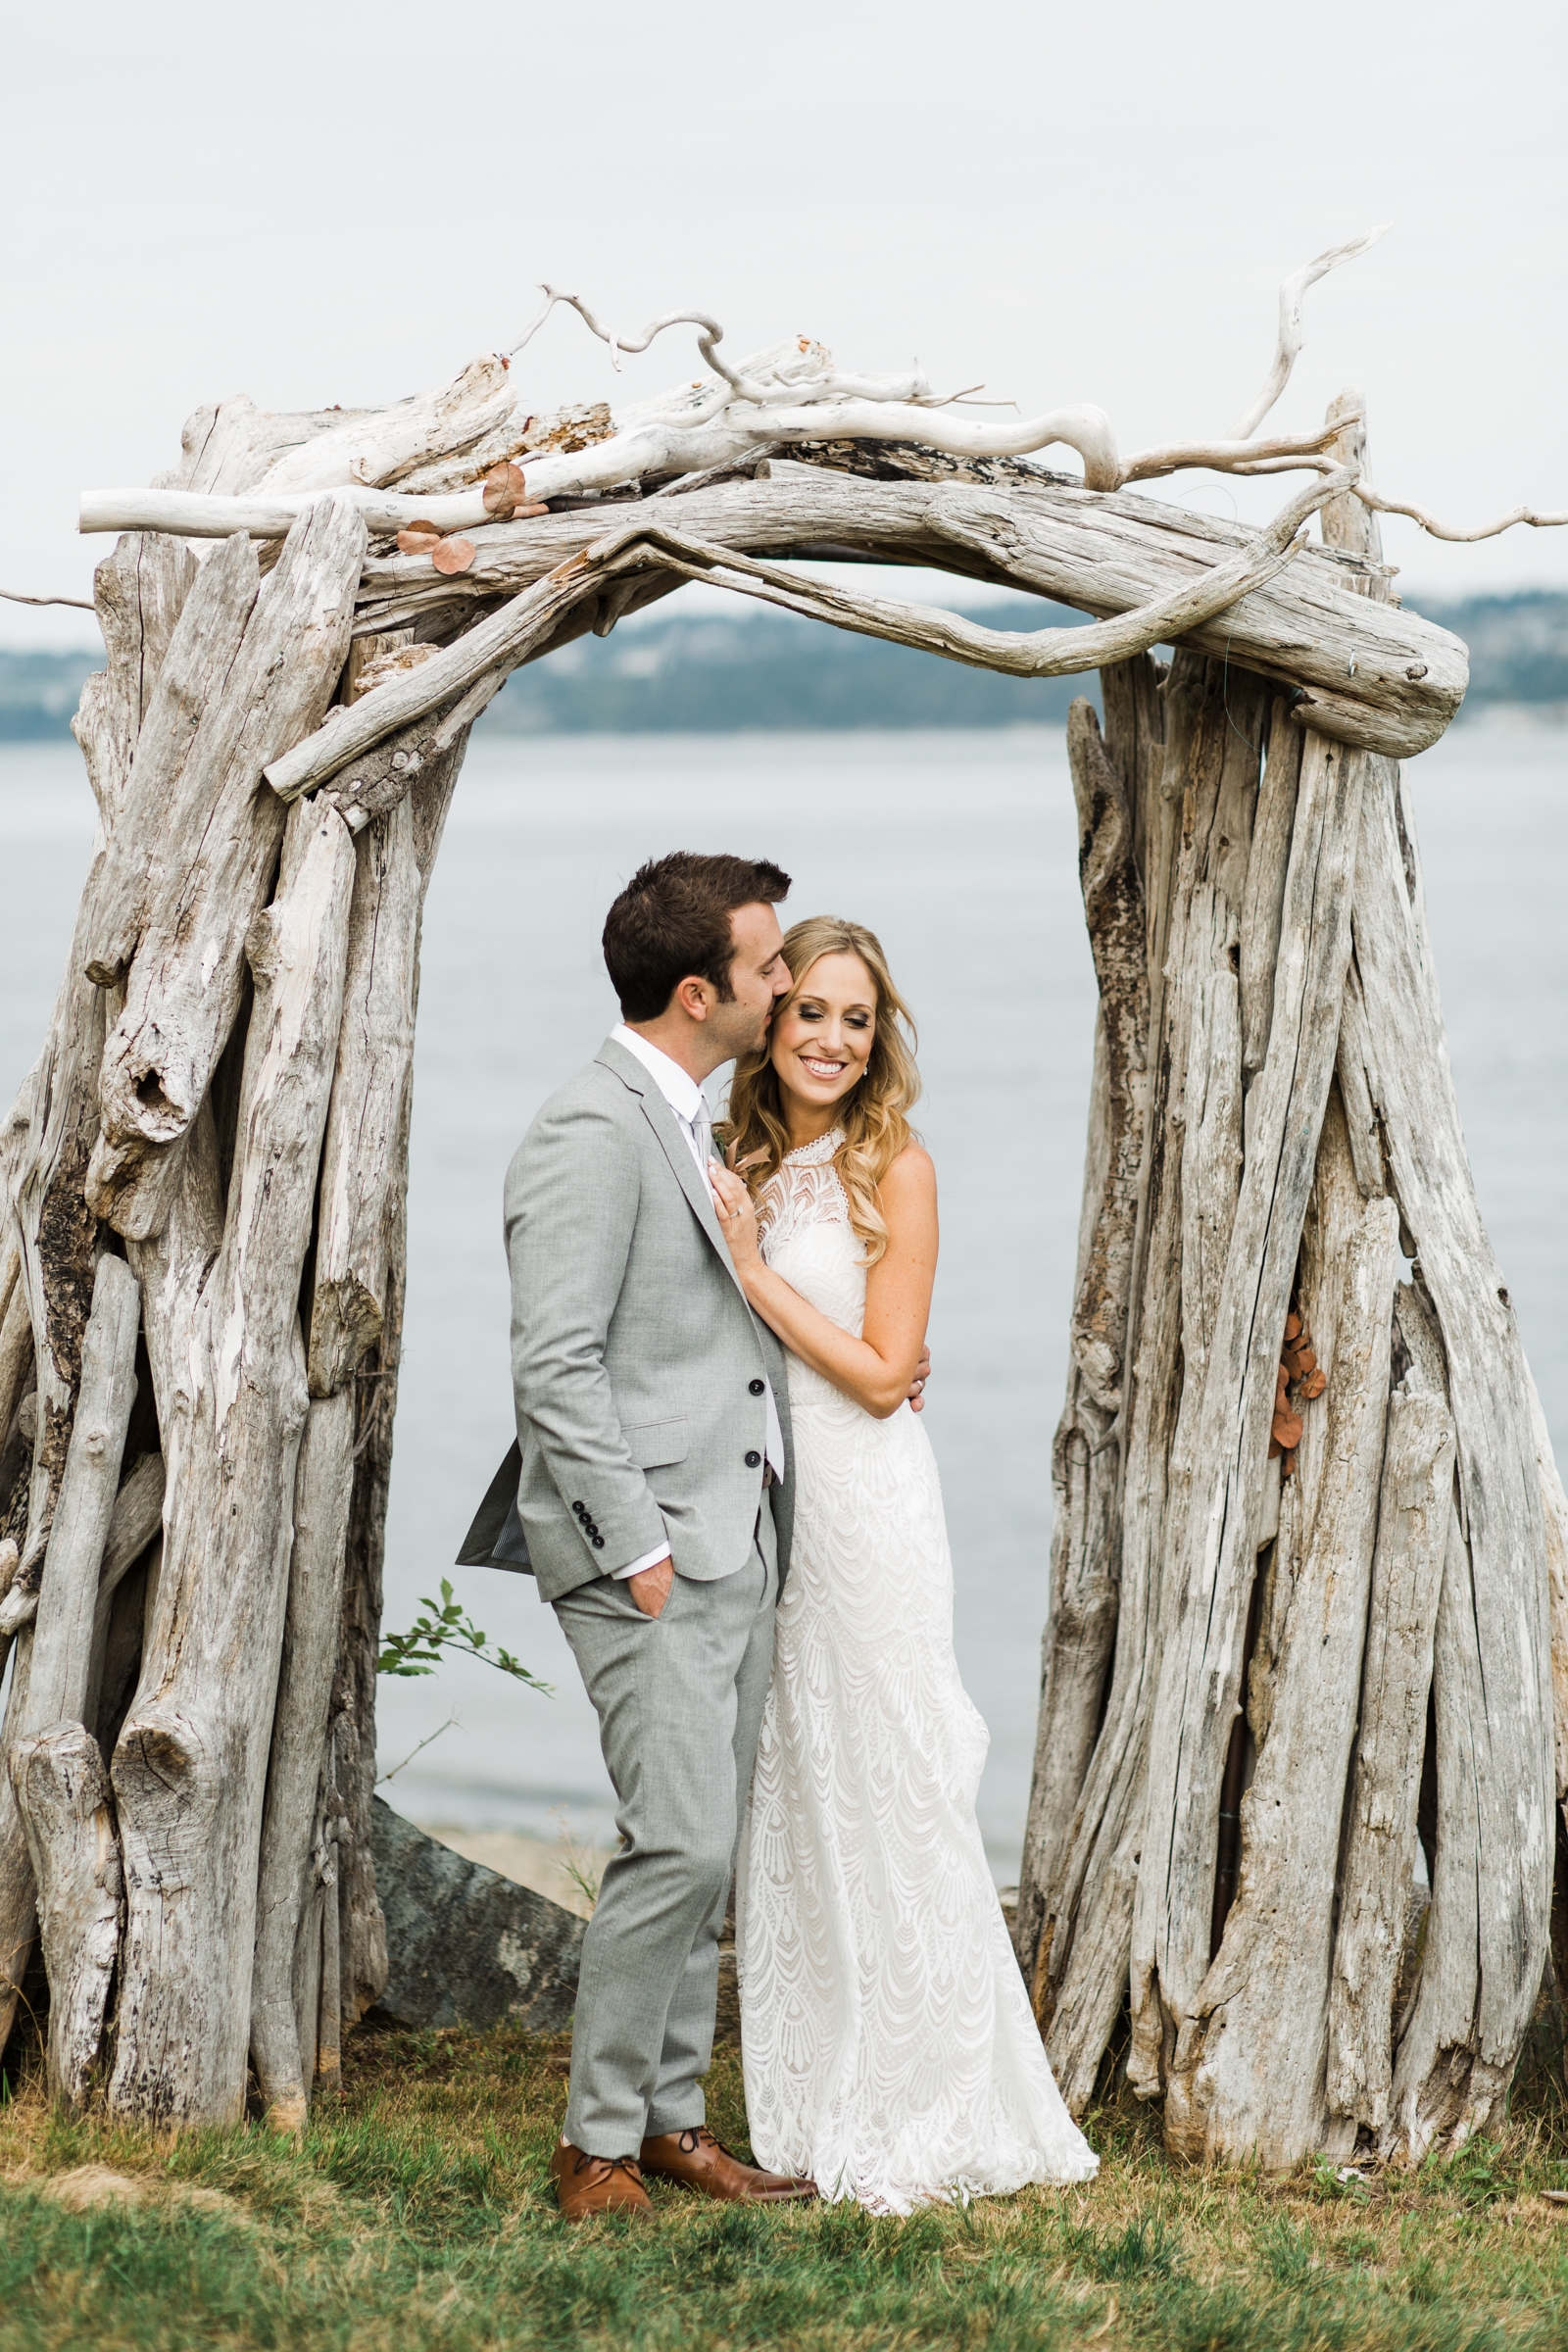 couple-cuddling-under-driftwood-arbor-stephanie-cristalli-photography-seattle